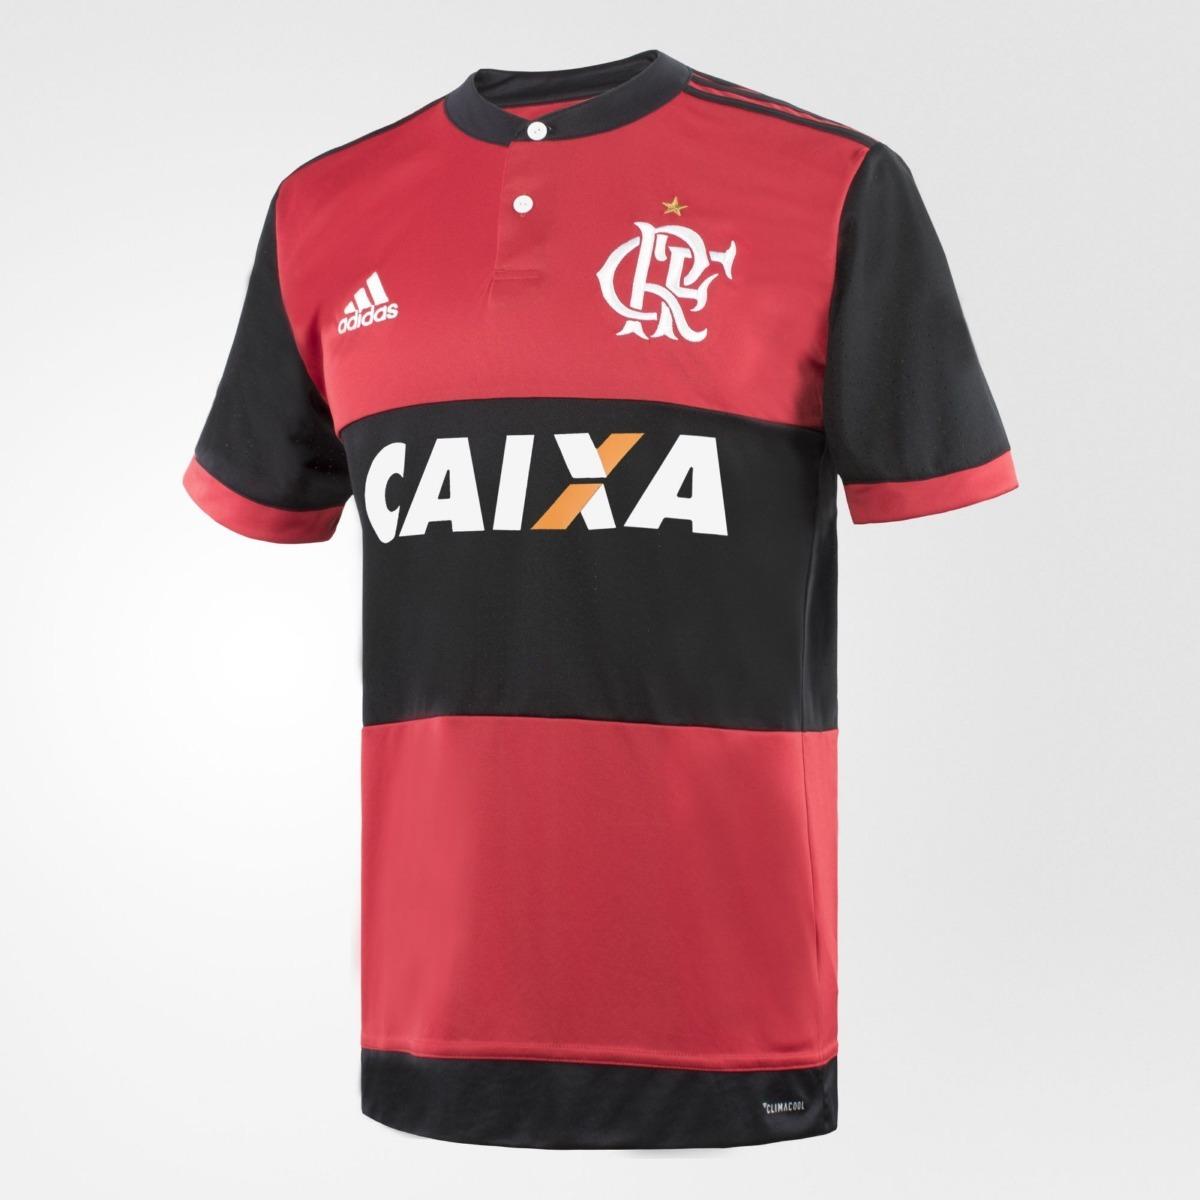 camisa blusa futebol flamengo adulto adidas oficial. Carregando zoom. 29686fab257bd